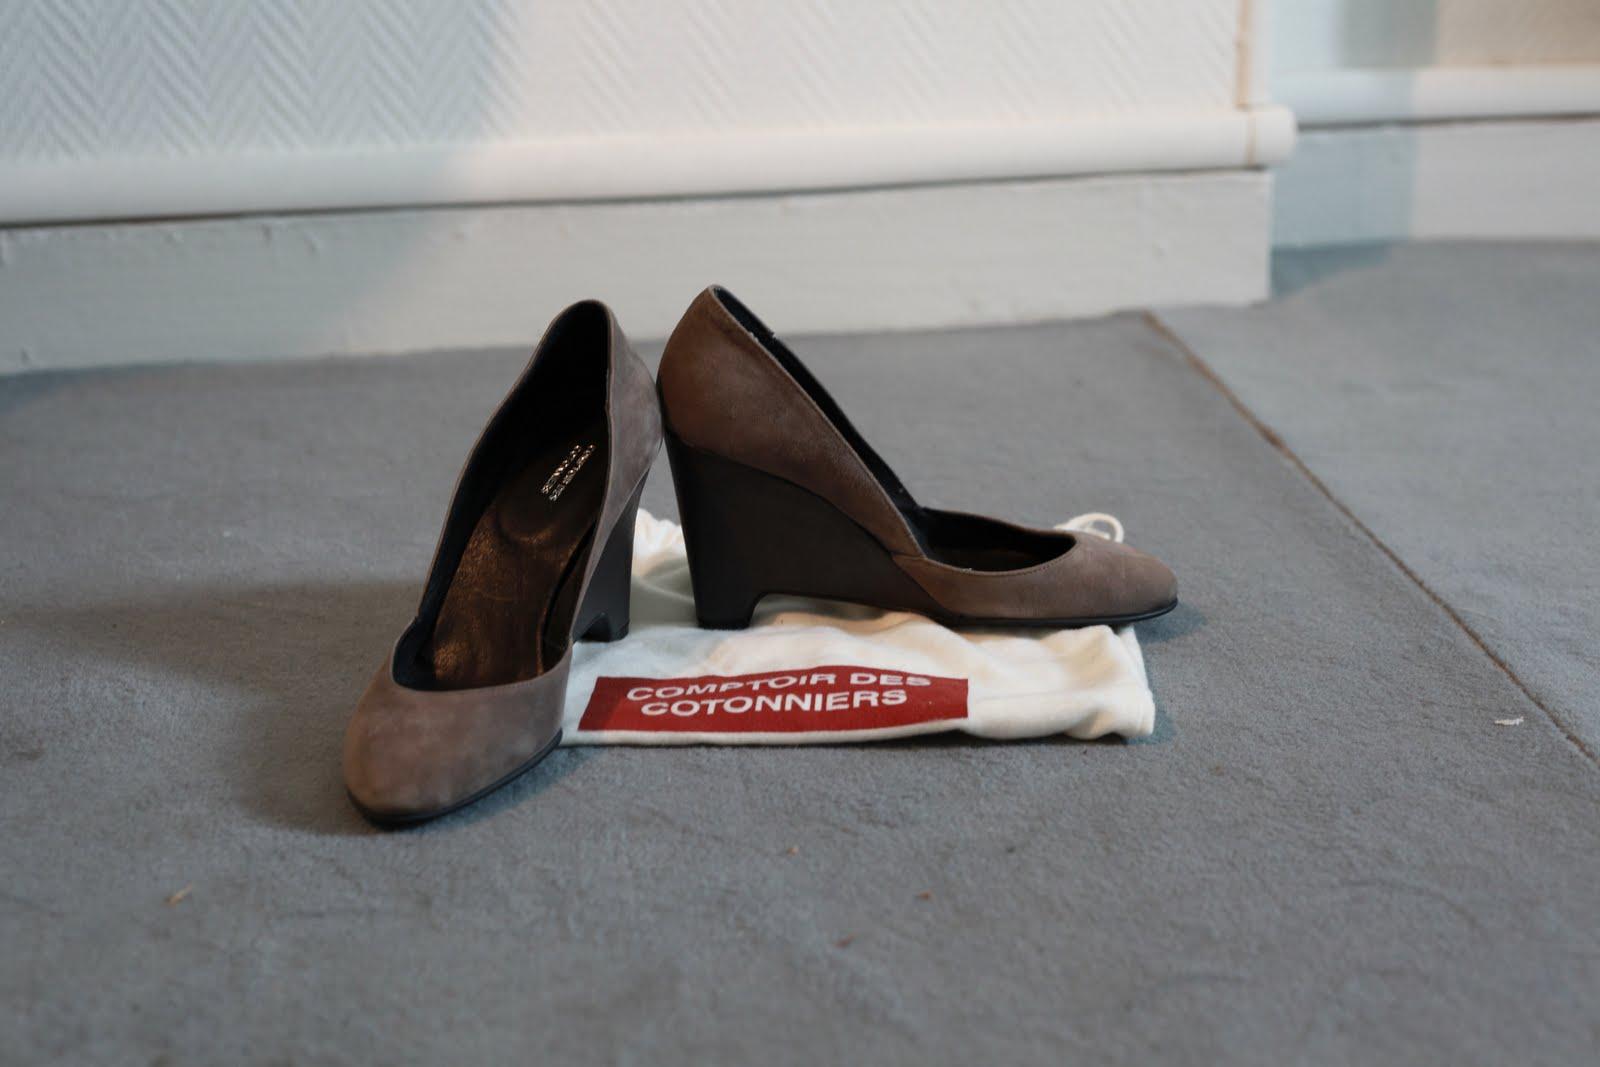 Le vide dressing de clara chaussures comptoir des cotonniers - Vide dressing comptoir des cotonniers ...